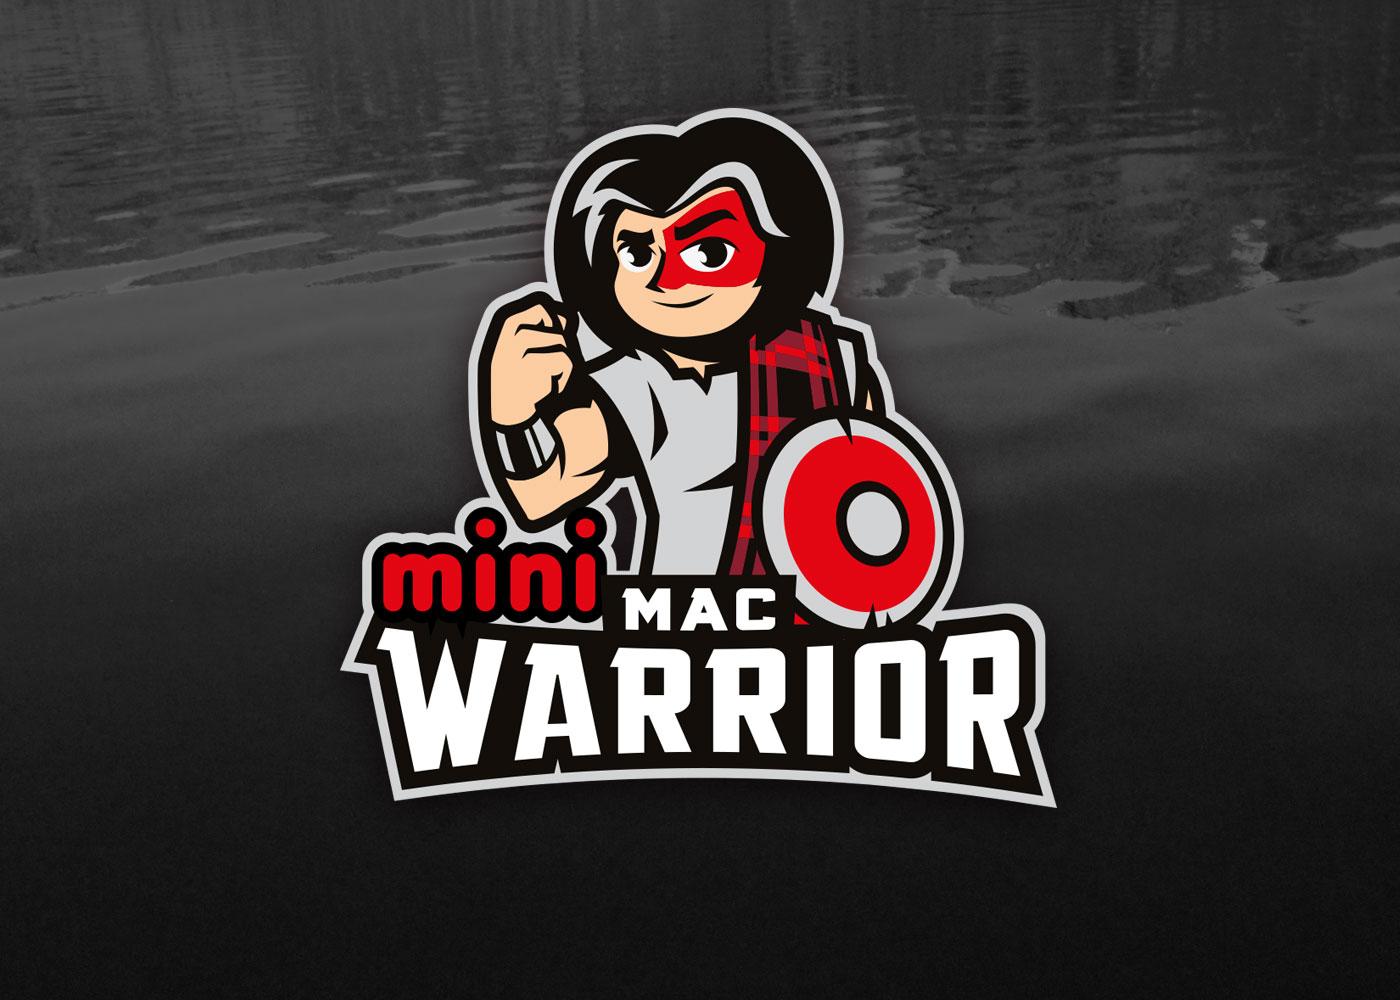 MAC-WARRIOR_WebPage_03